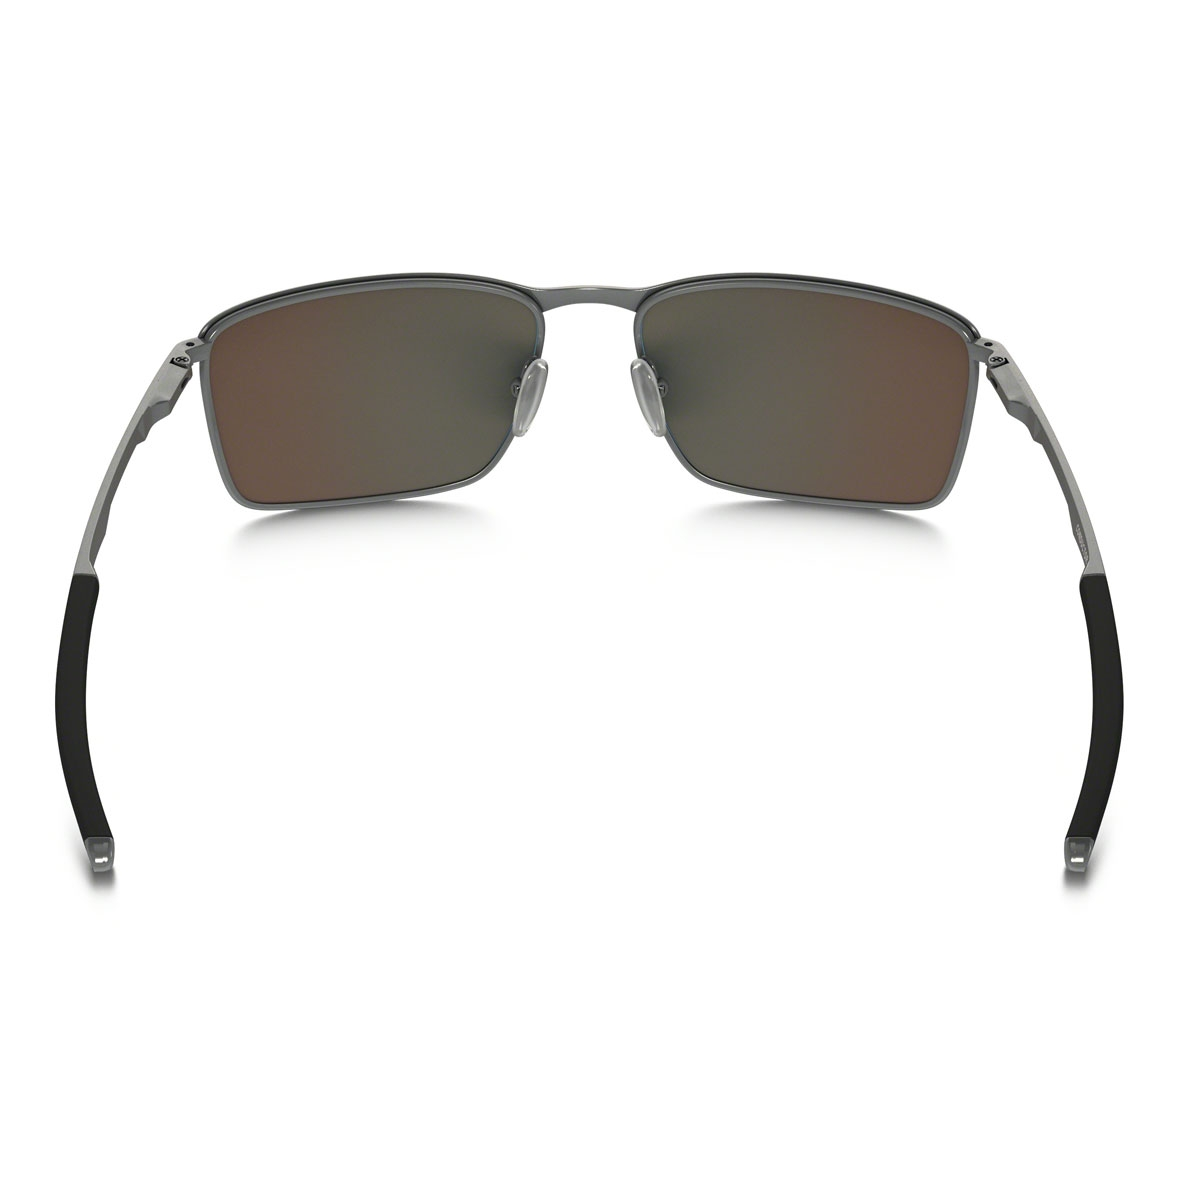 Oakley Conductor 6 Sunglasses Lead Frame Sapphire